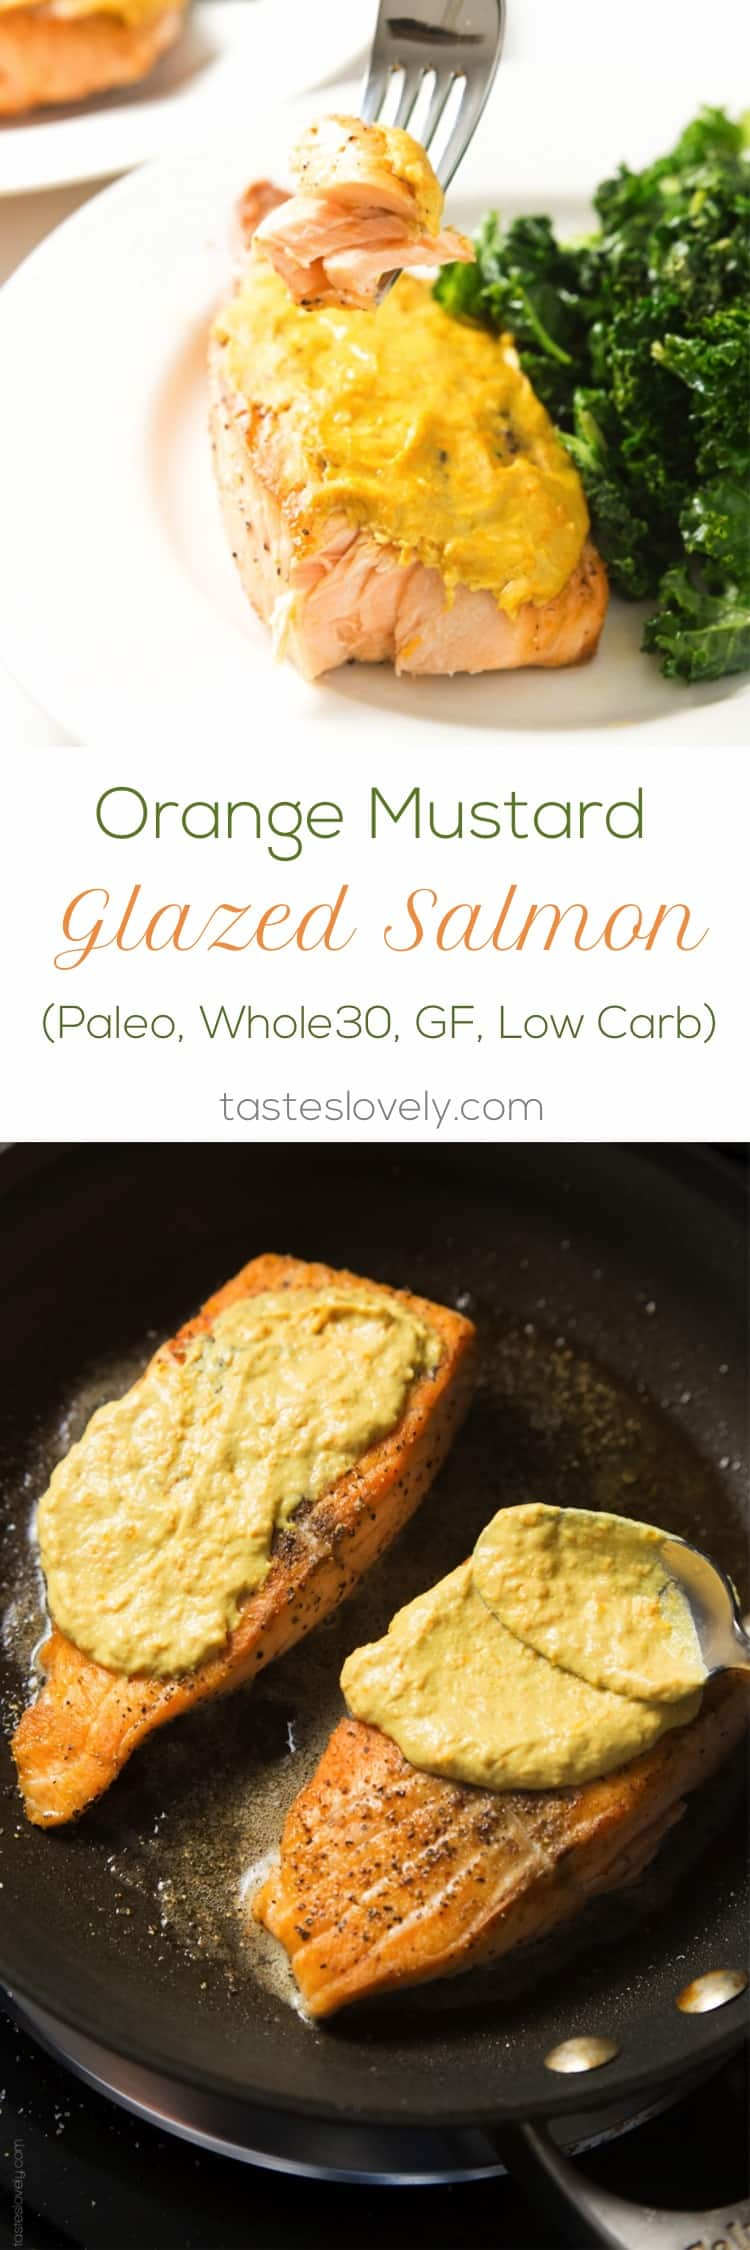 Orange Mustard Glazed Salmon | tasteslovely.com